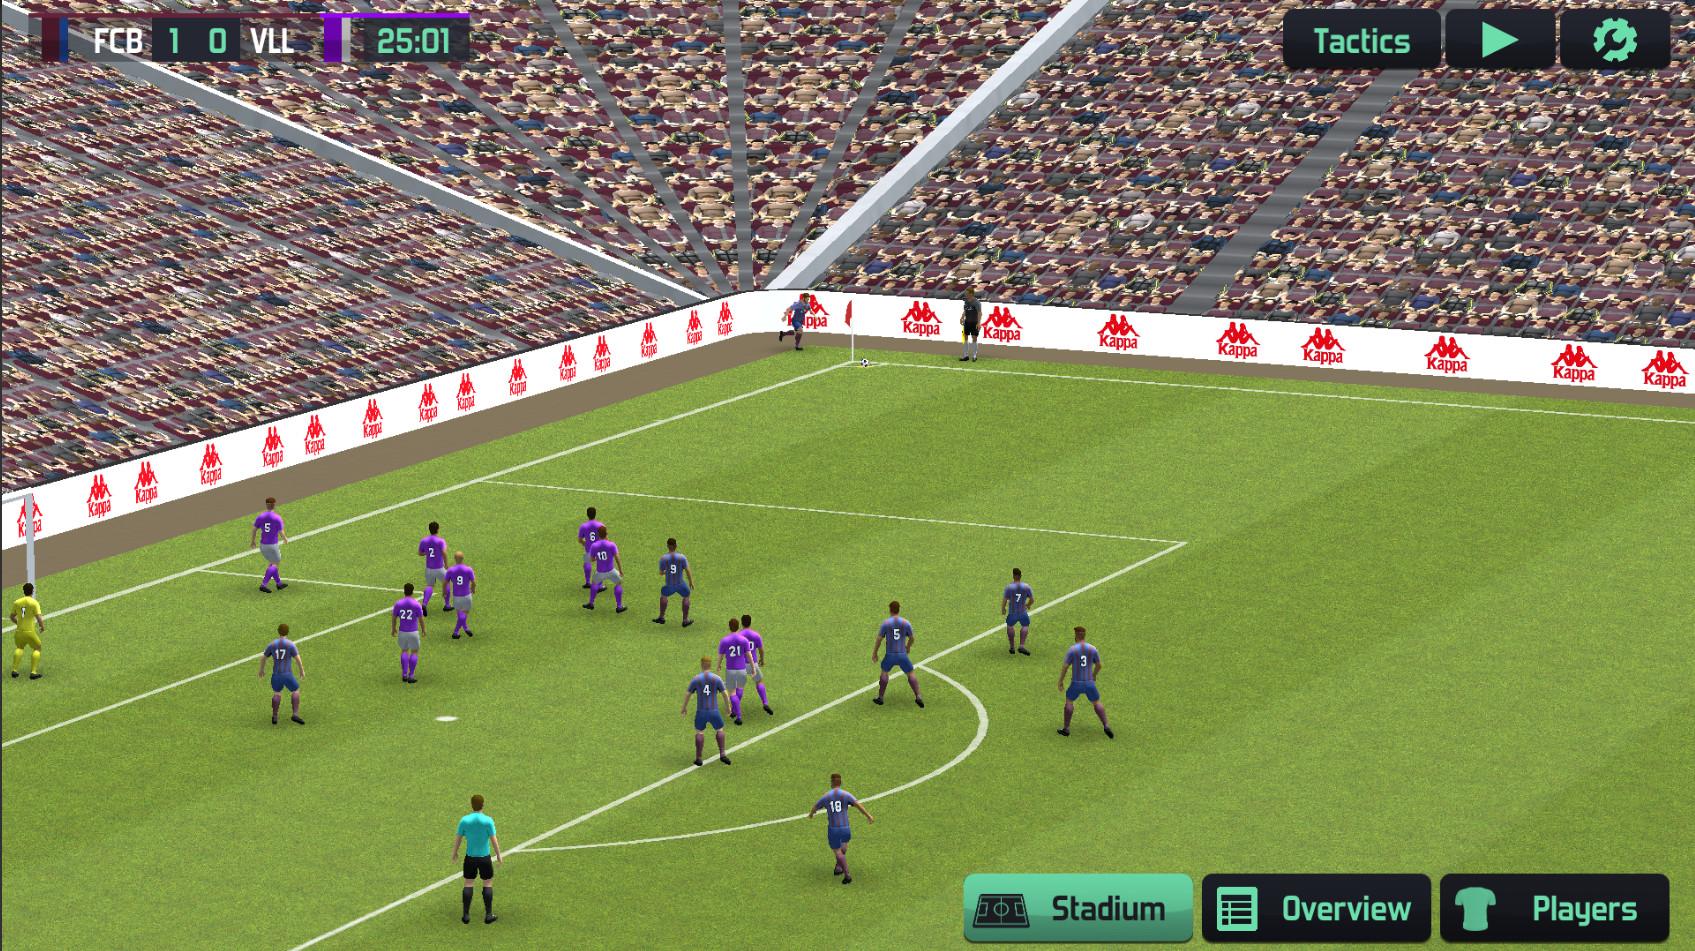 Soccer Manager 2020 on Steam